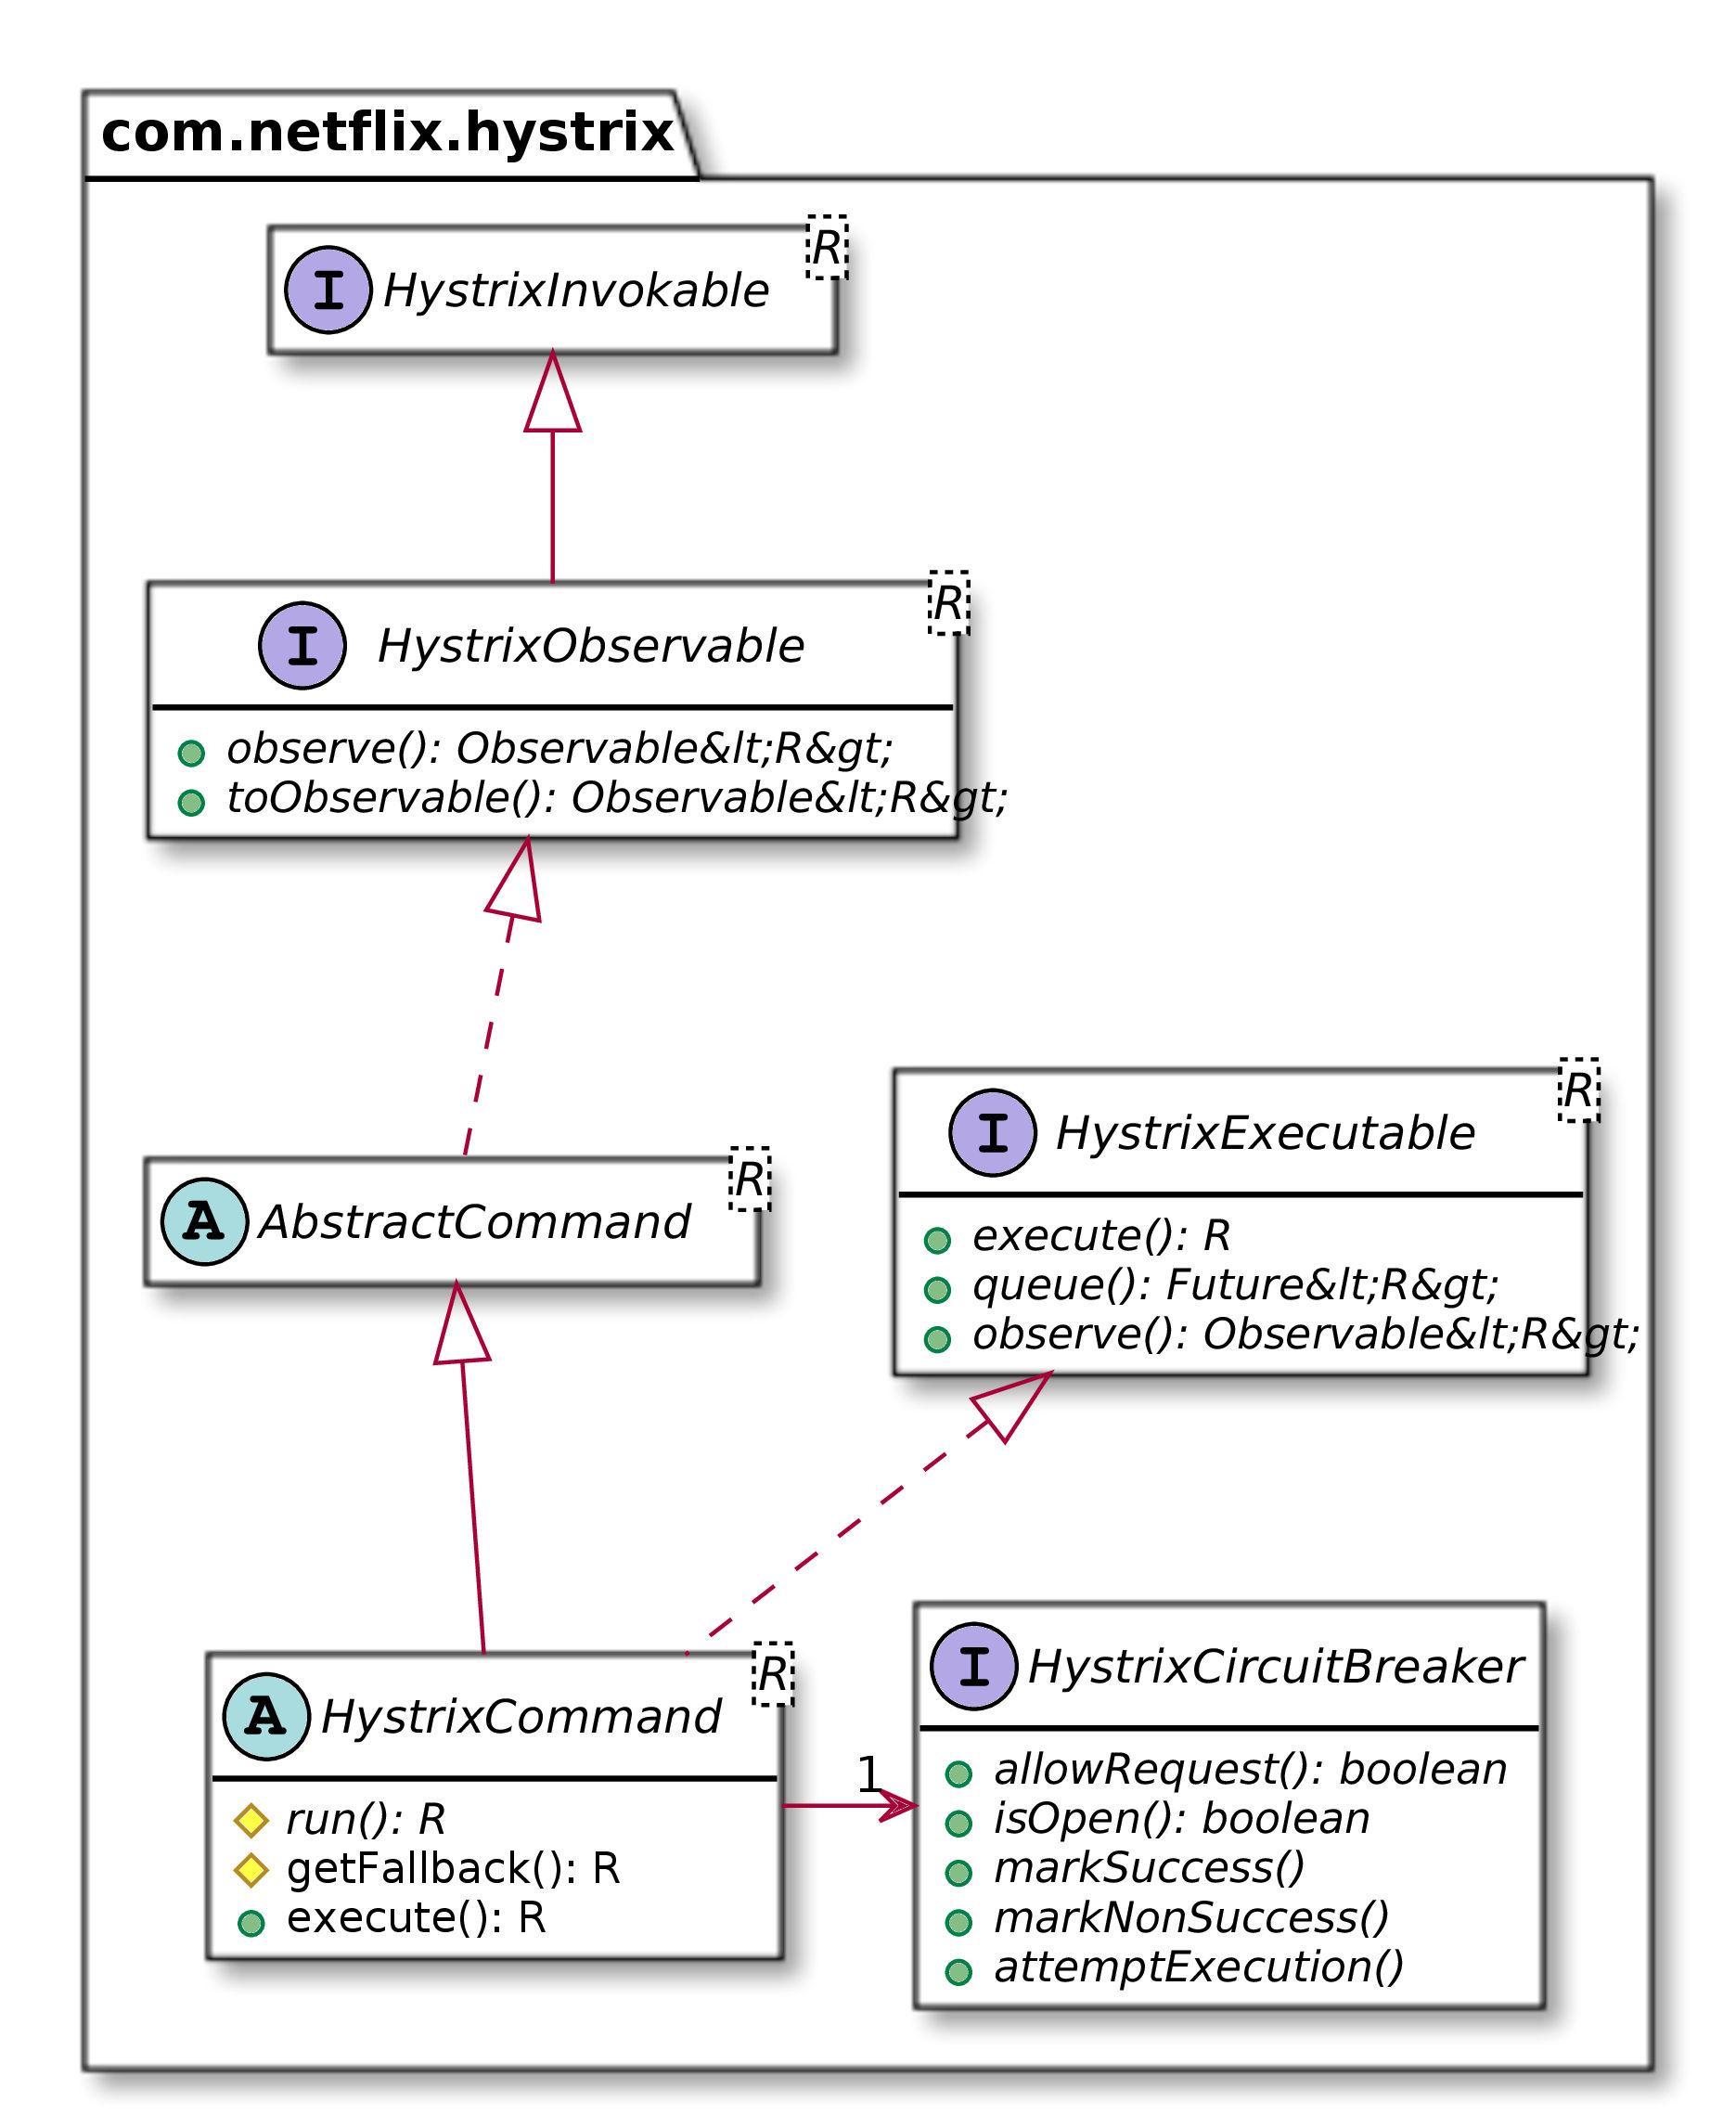 hystrix-class-diagram.jpg